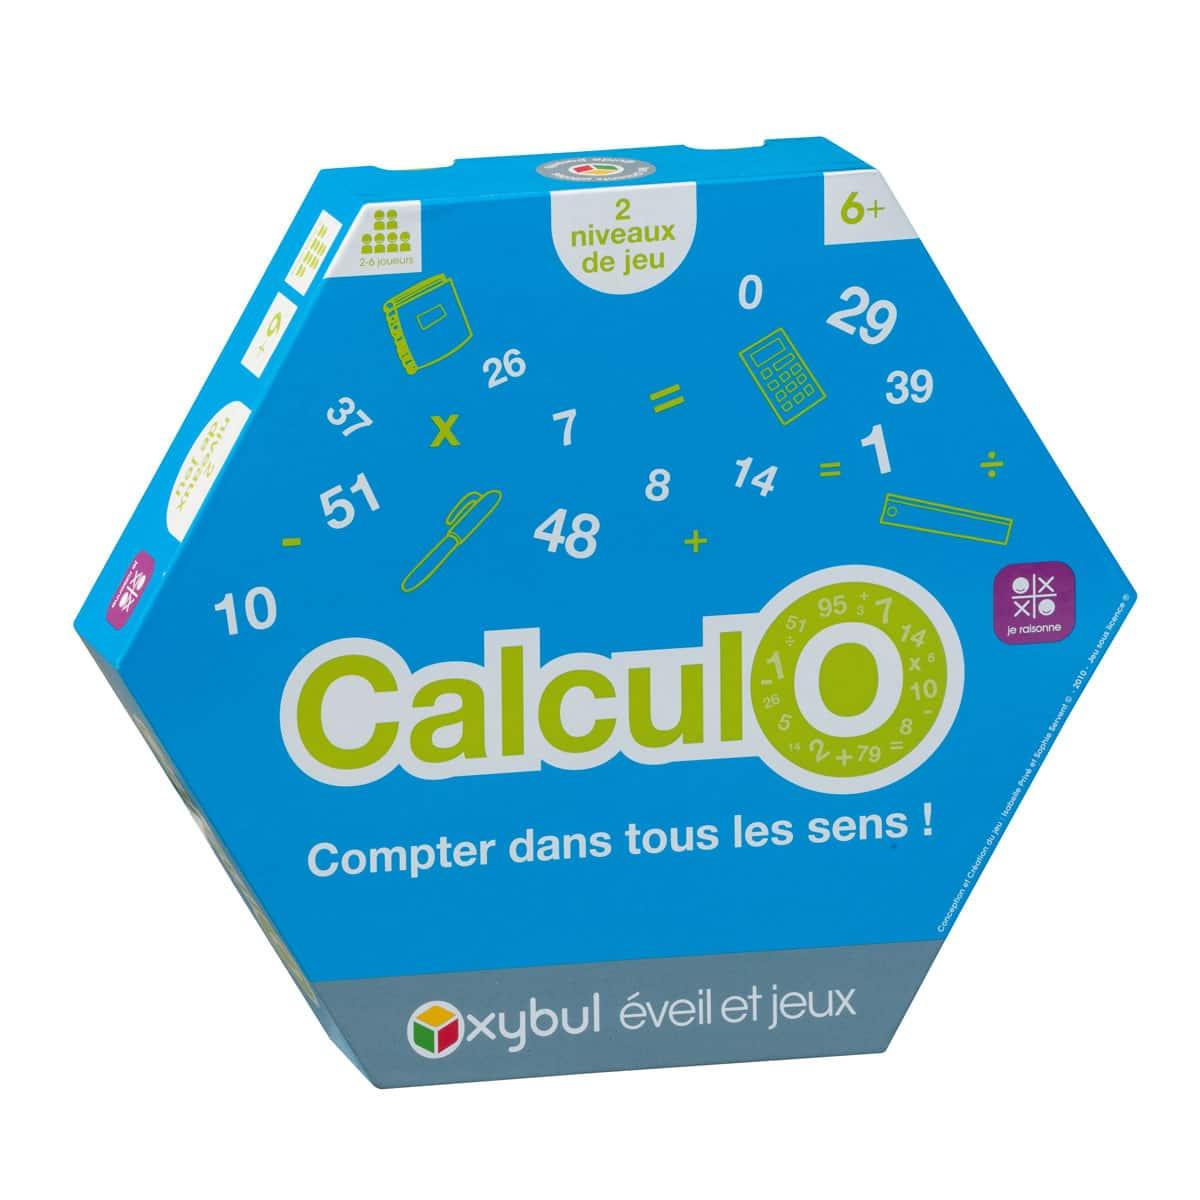 jeux-de-societe-math-calculo-educabul